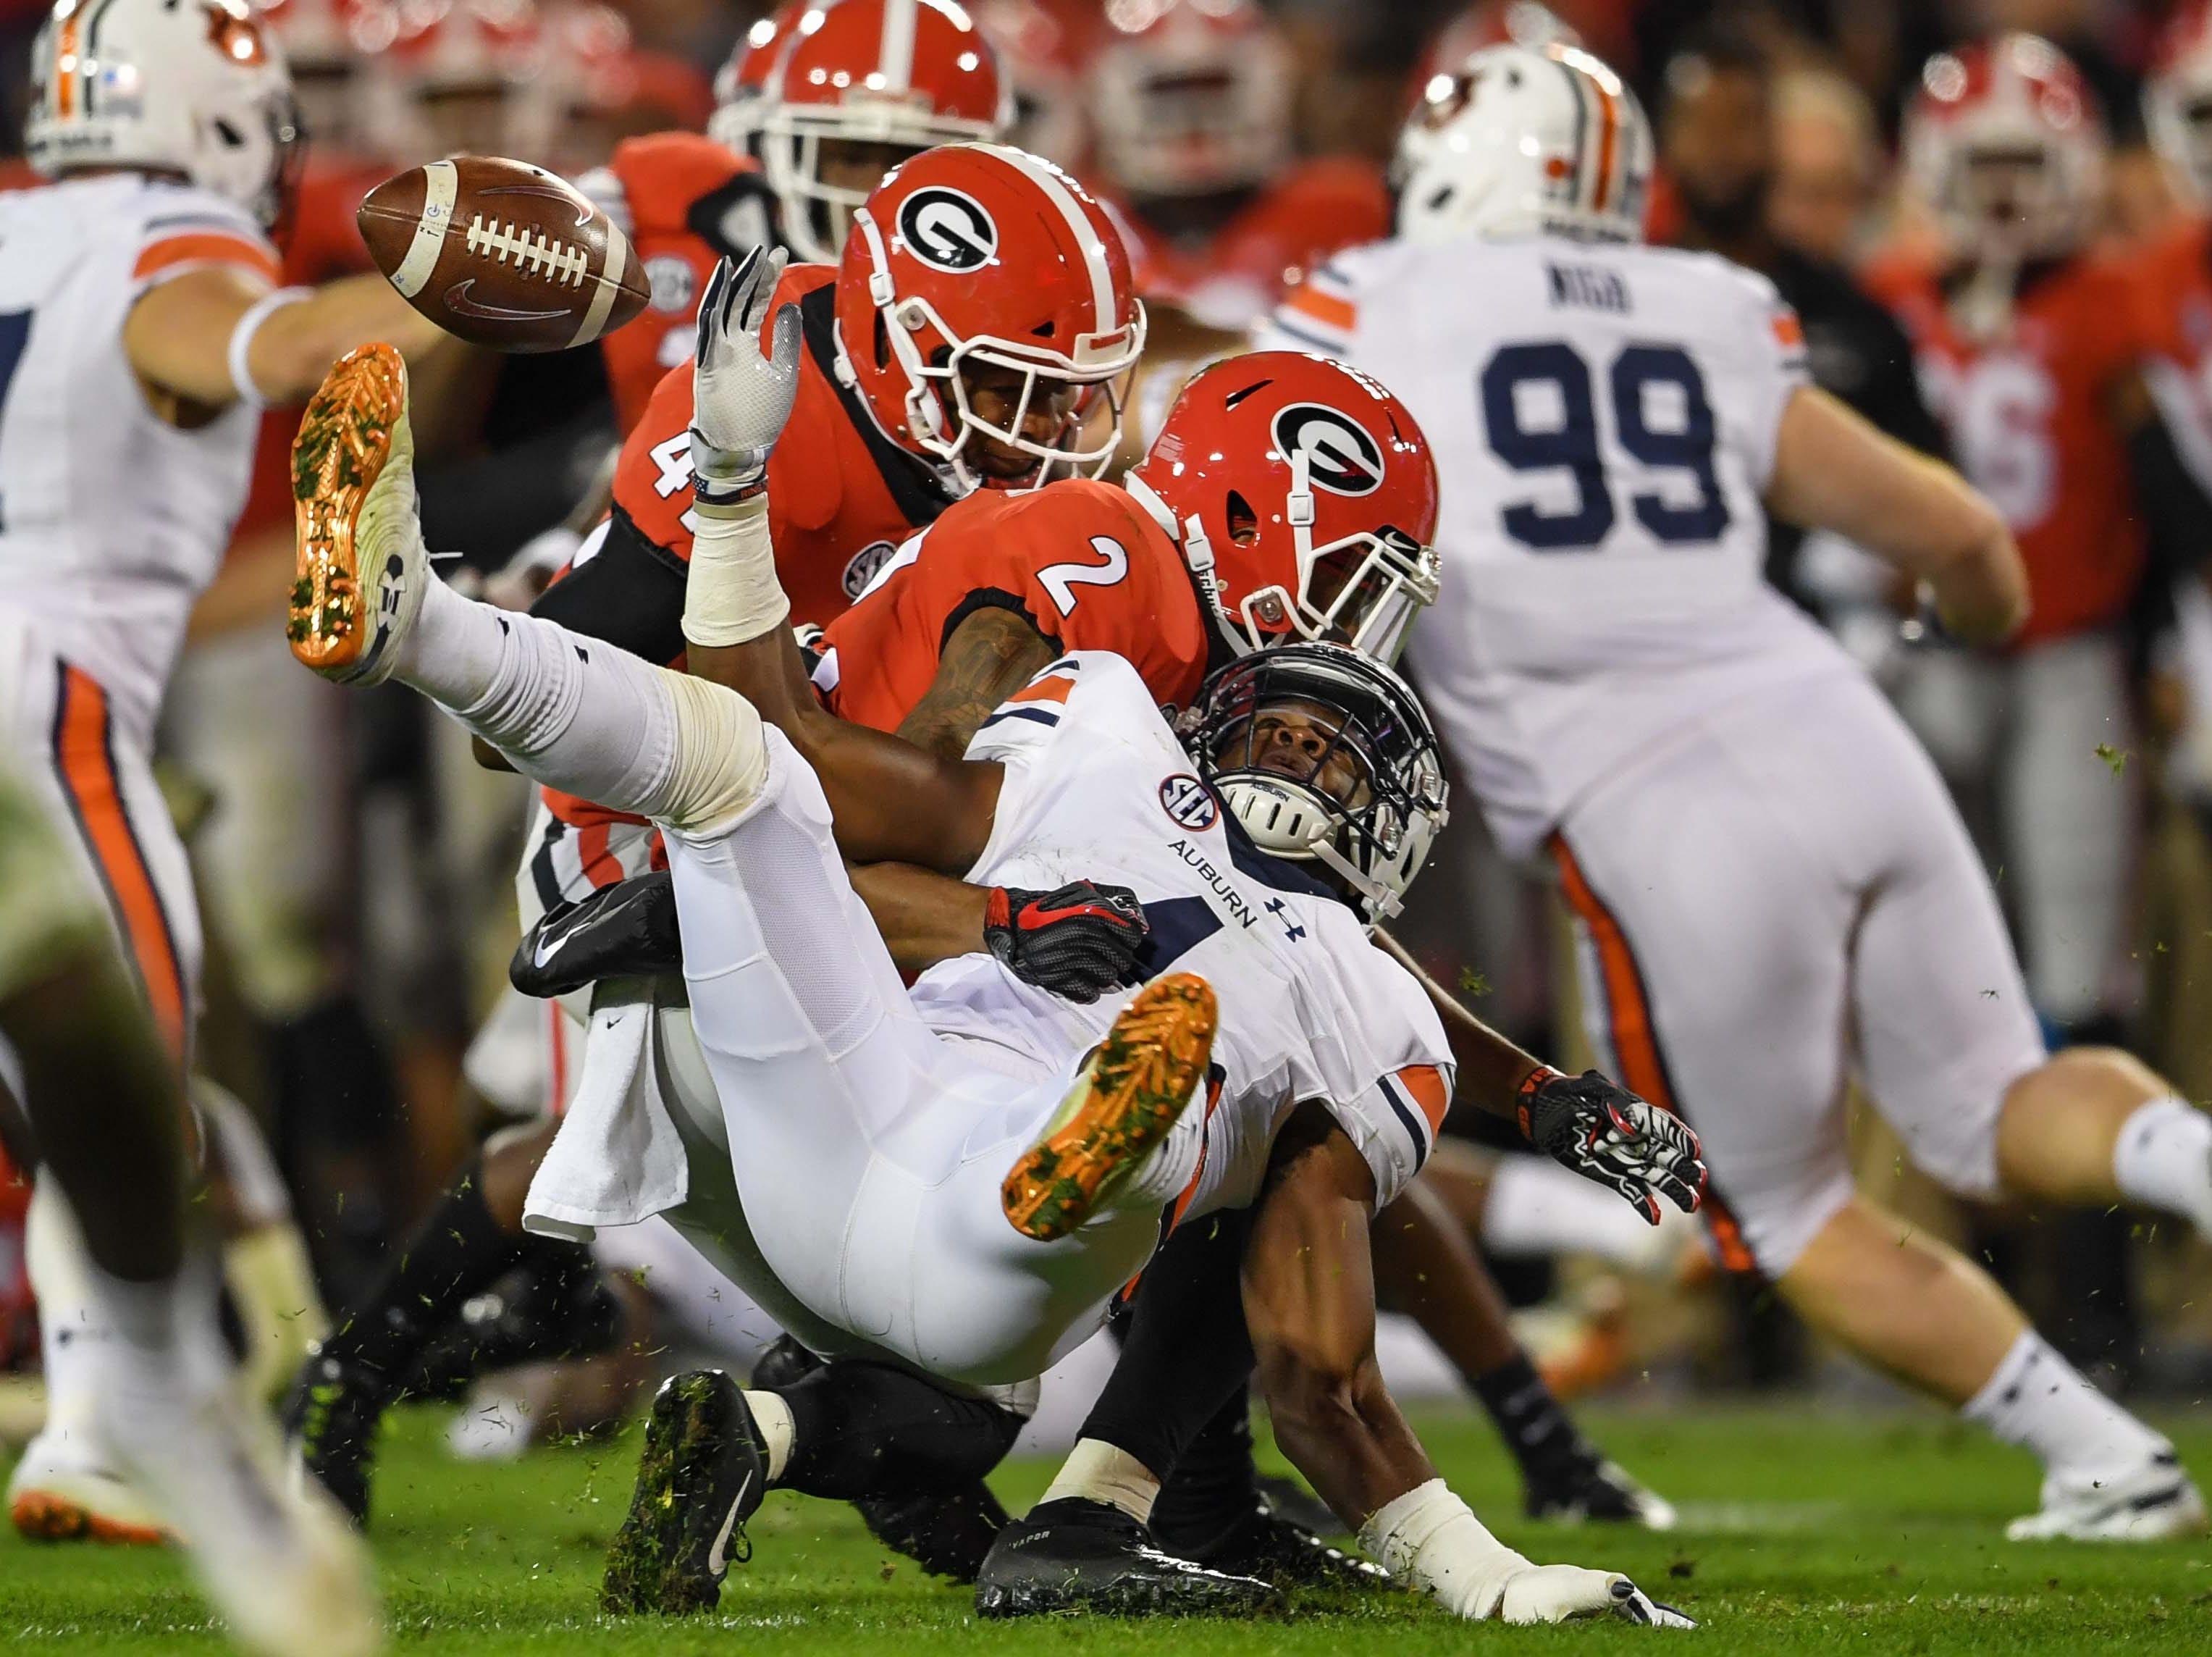 Week 11: Auburn Tigers kick returner Noah Igbinoghene (4) fumbles after being hit by Georgia Bulldogs linebacker Robert Beal Jr. (not shown) during the first half at Sanford Stadium.